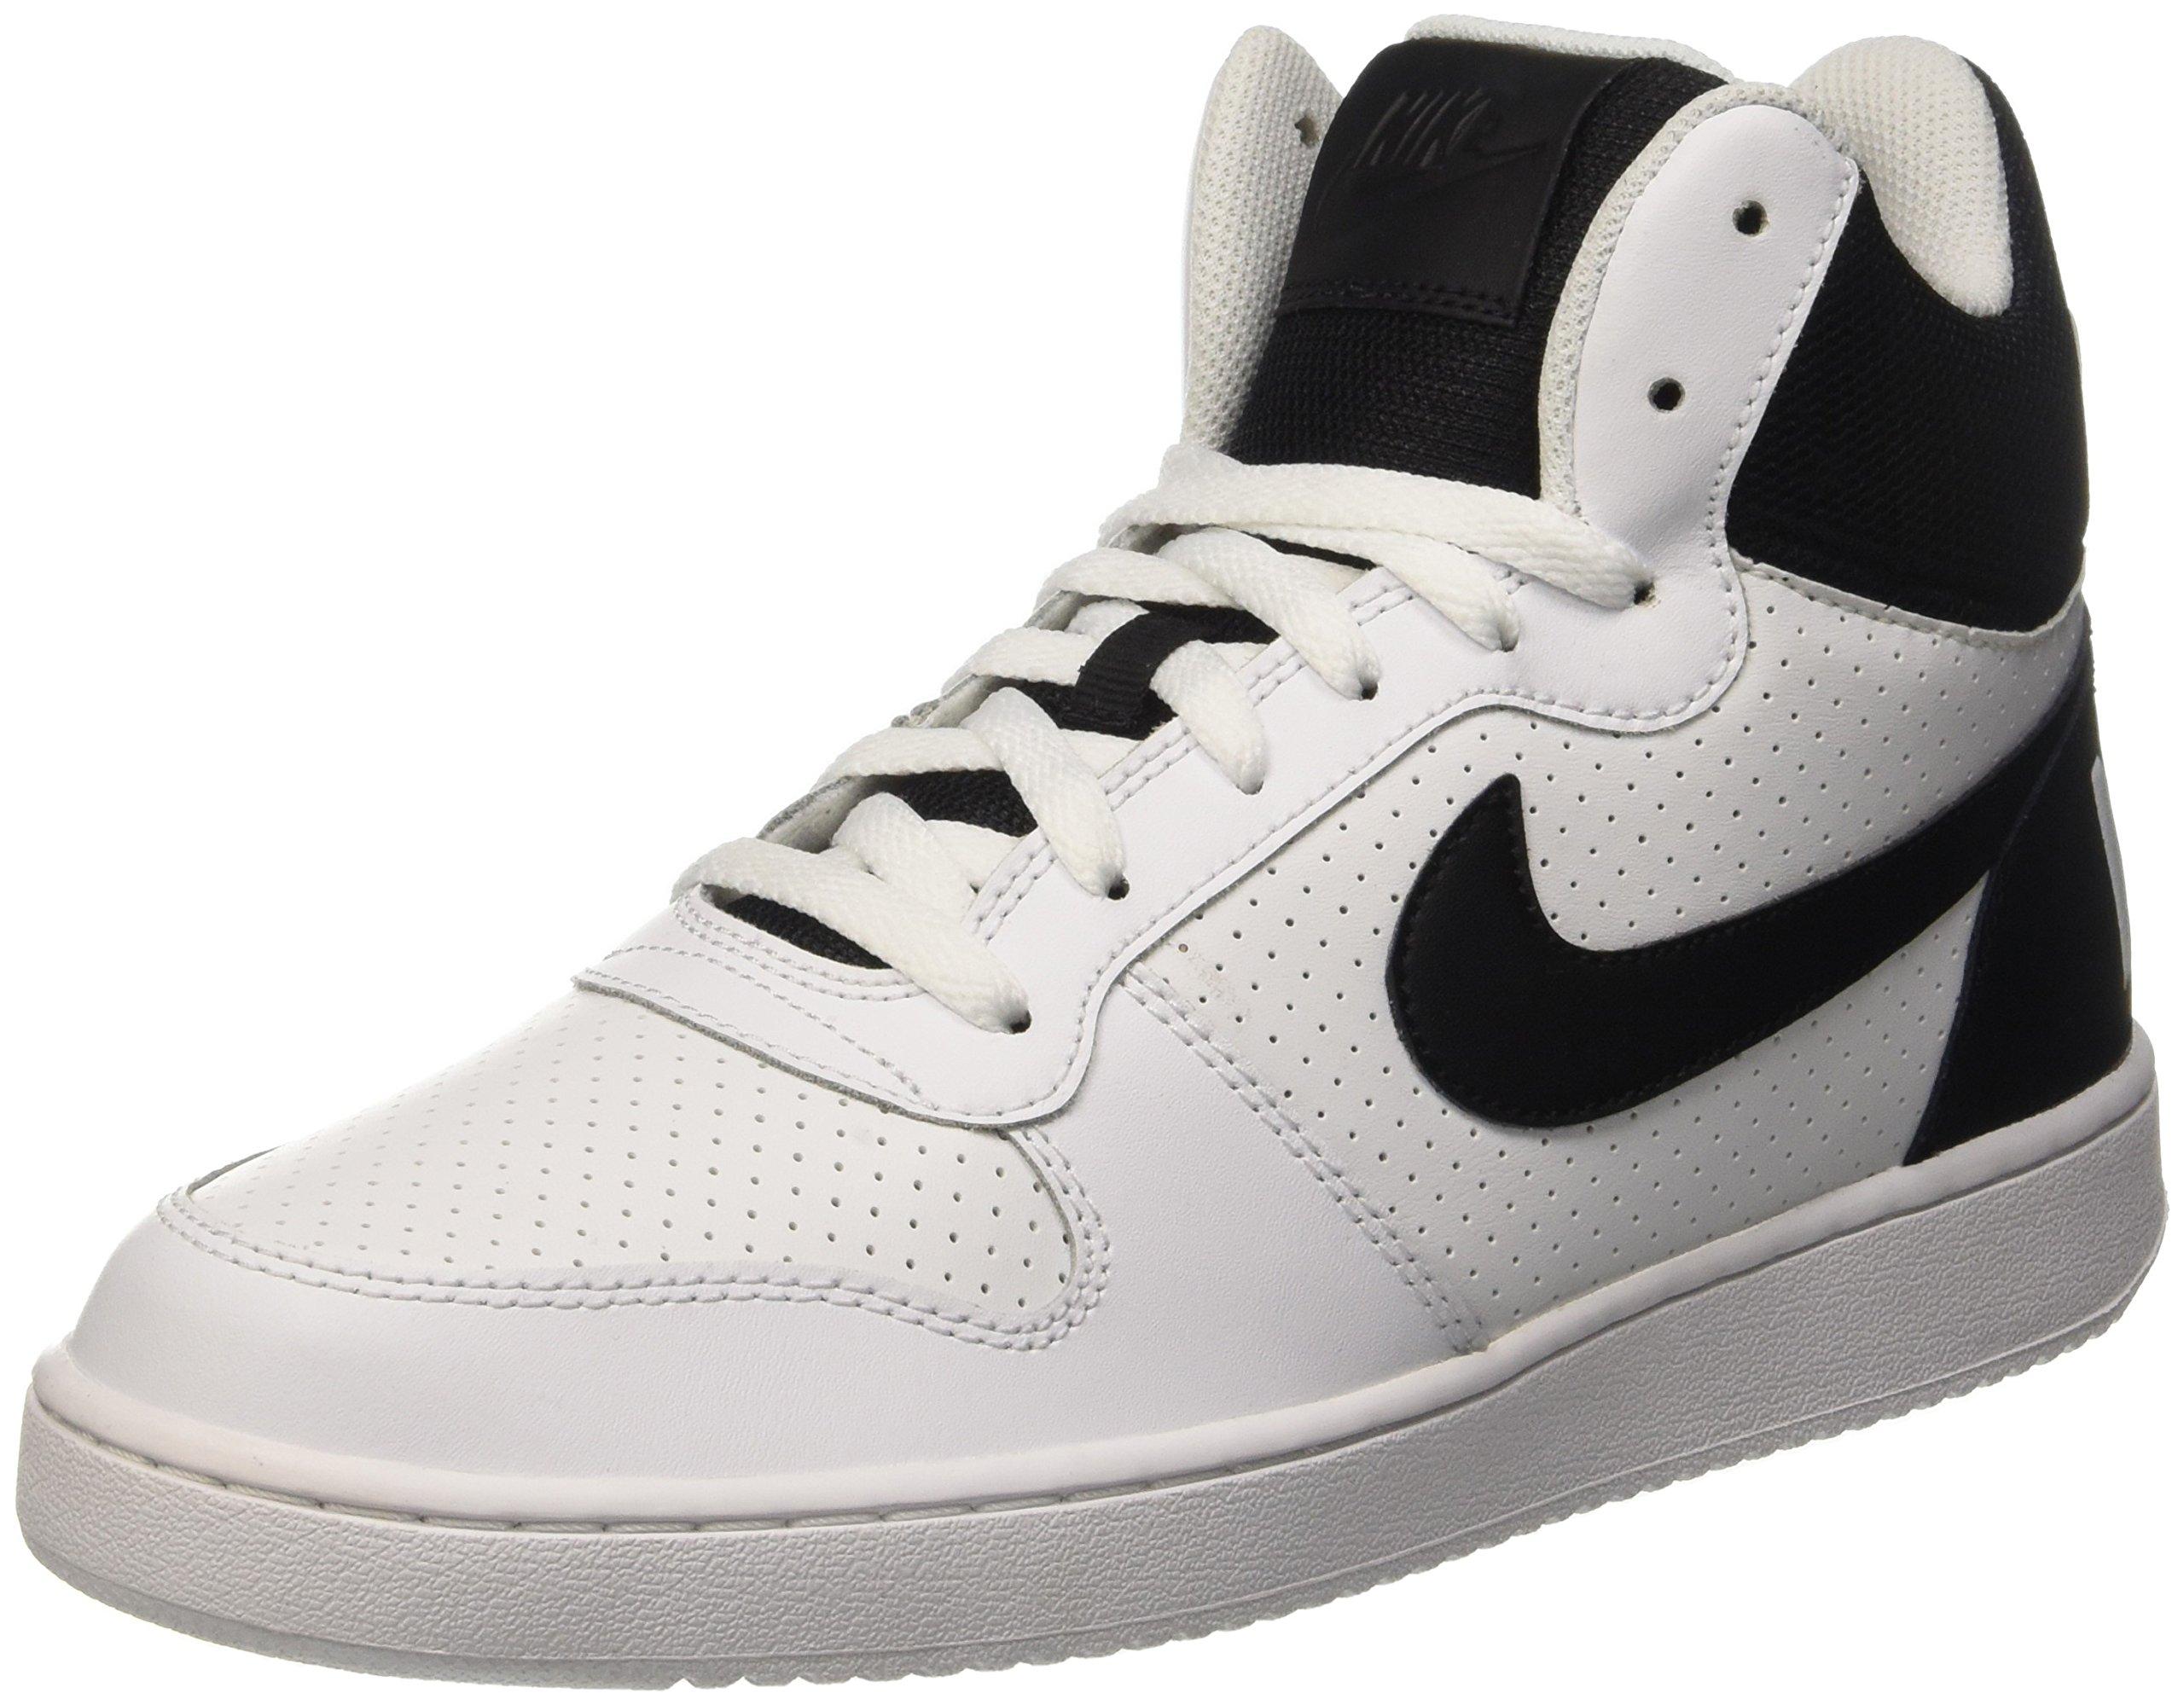 1564084bff1cf8 Galleon - Nike Men s Court Borough Mid Basketball Shoe